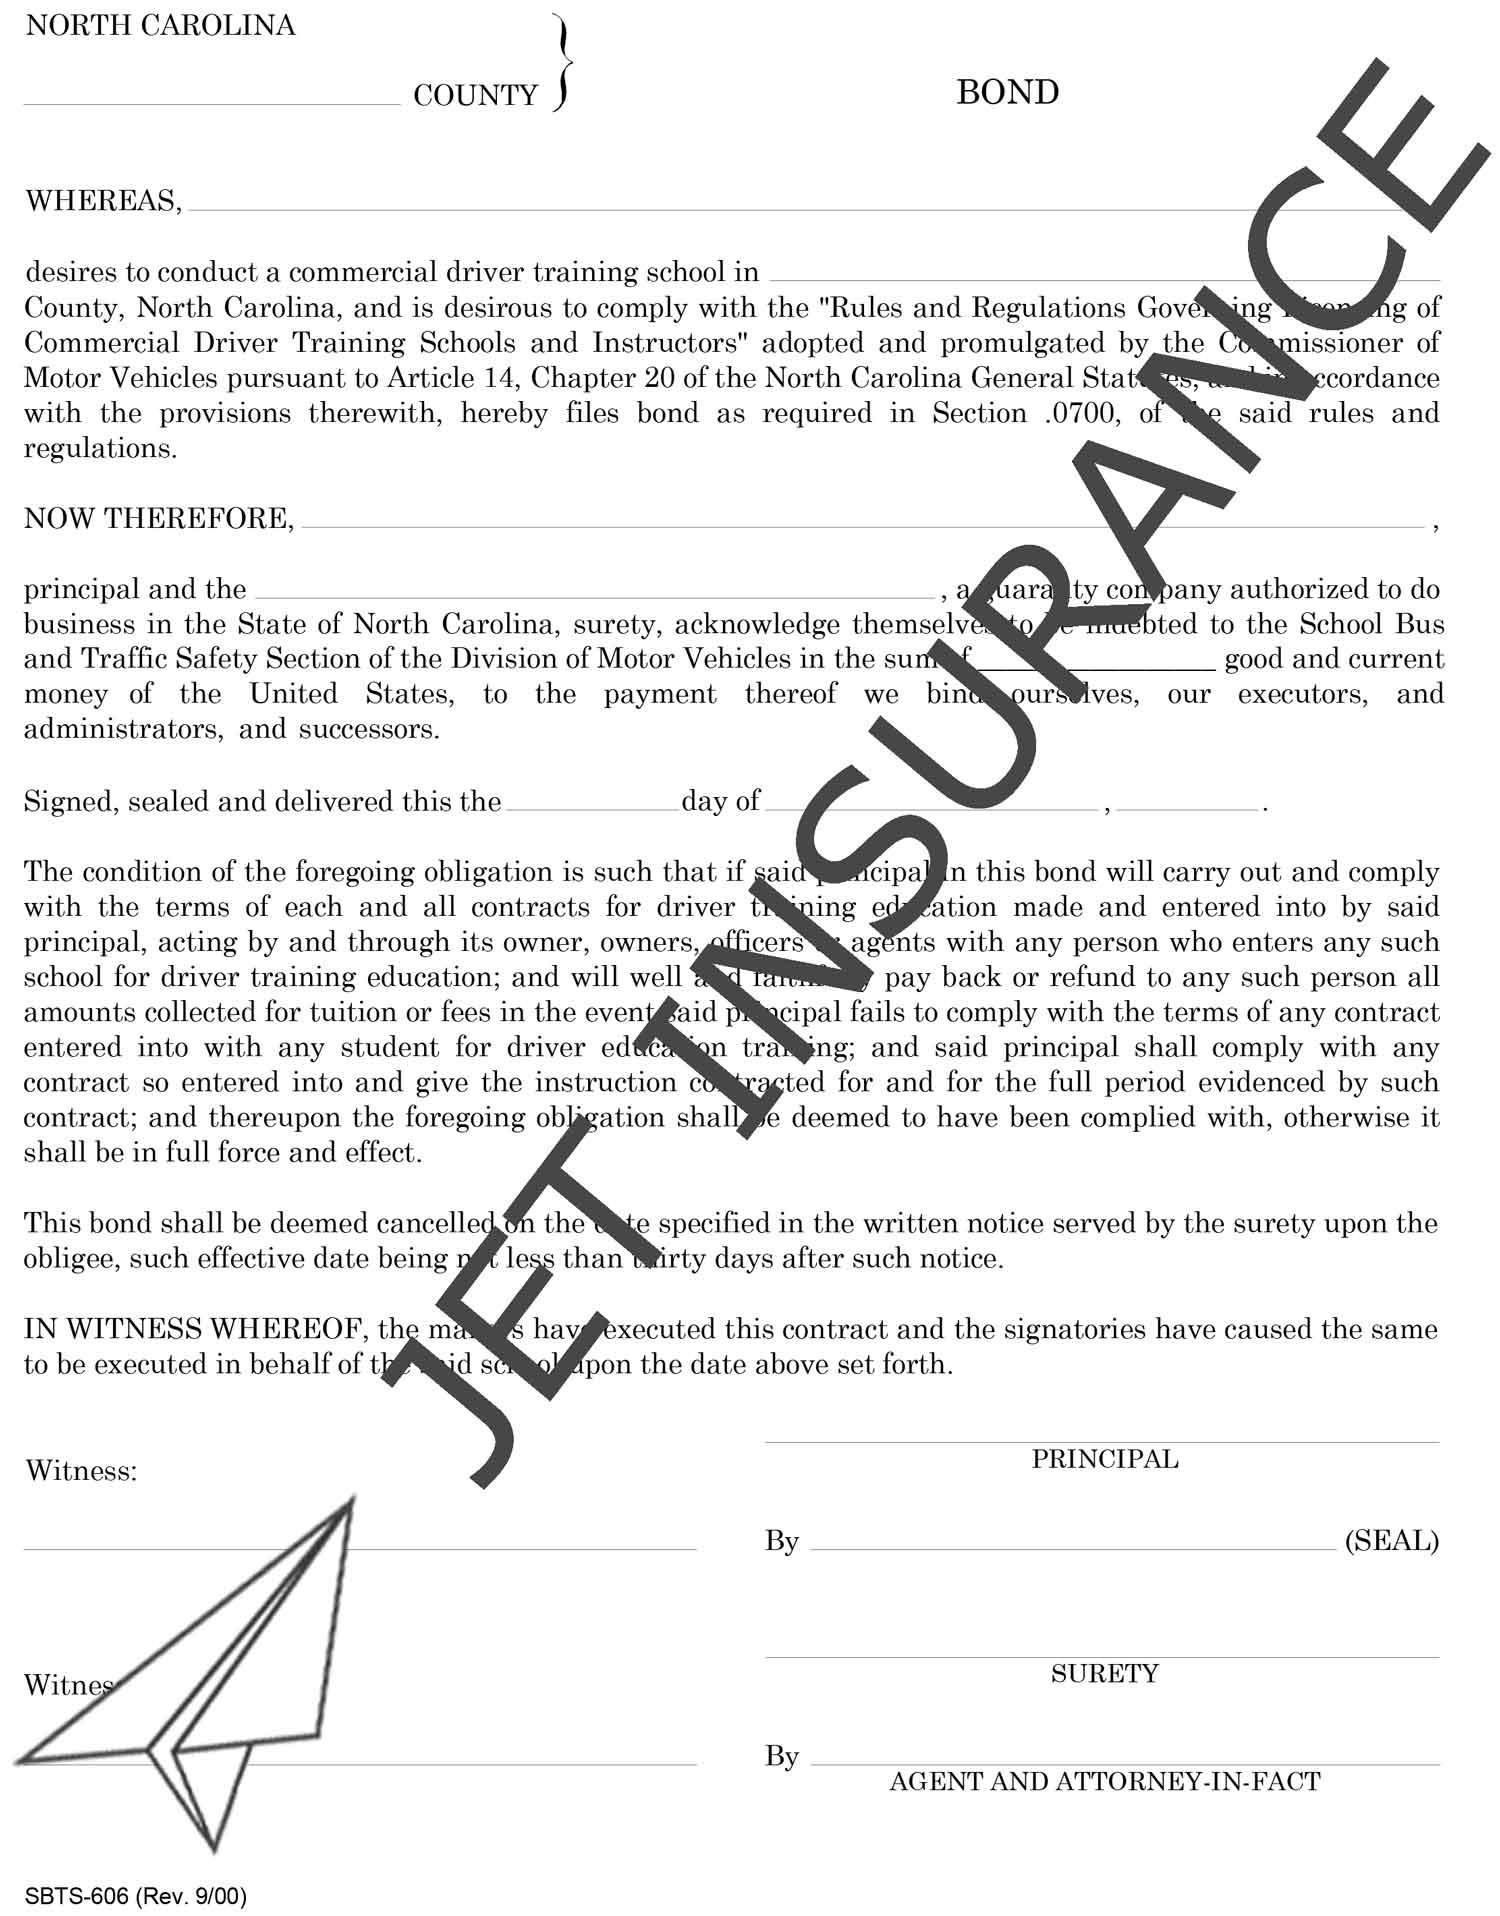 North Carolina Commercial Driver Training School Bond Form